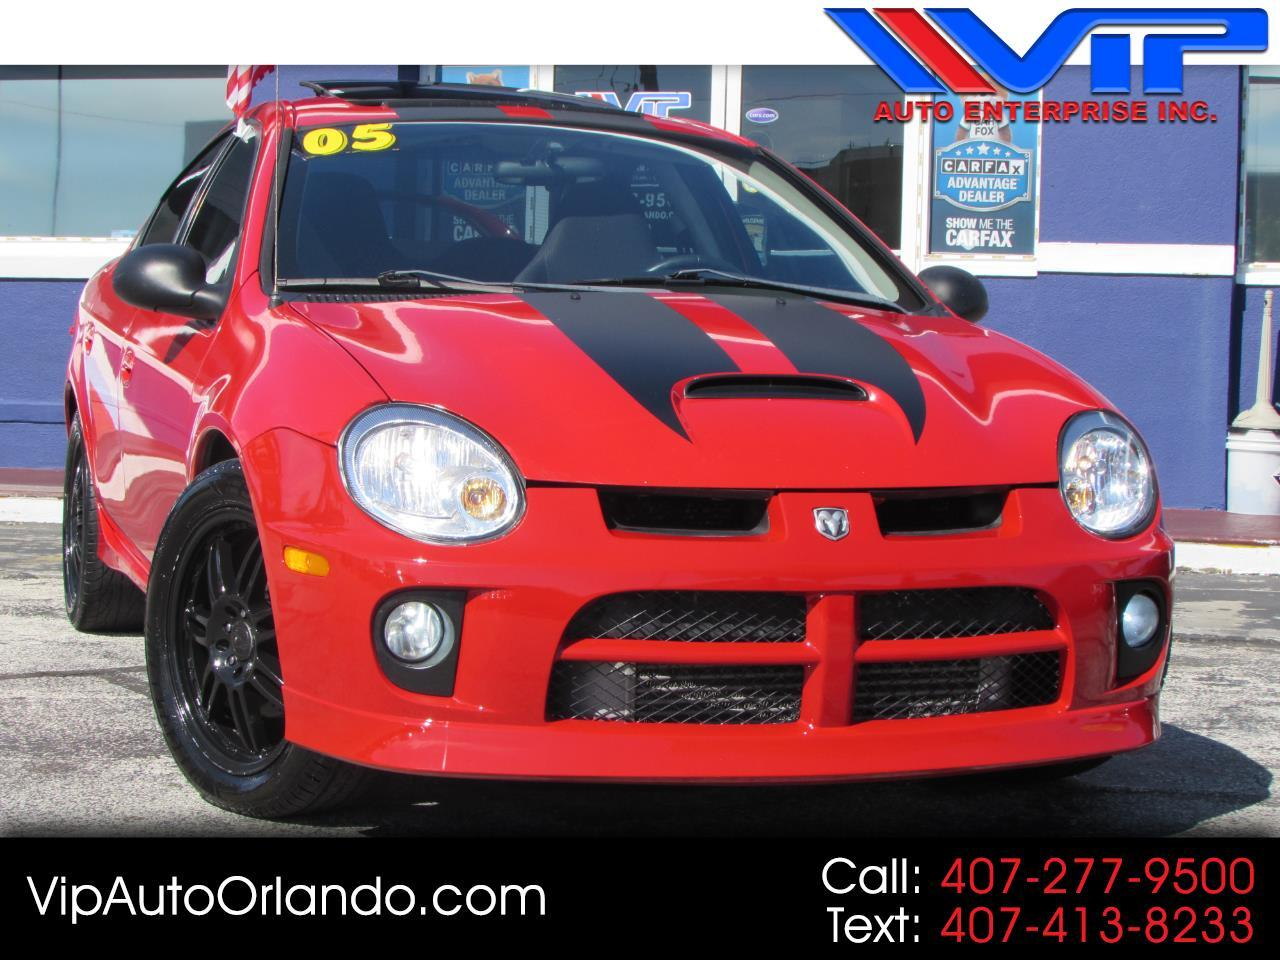 2005 Dodge Neon 4dr Sdn SRT4